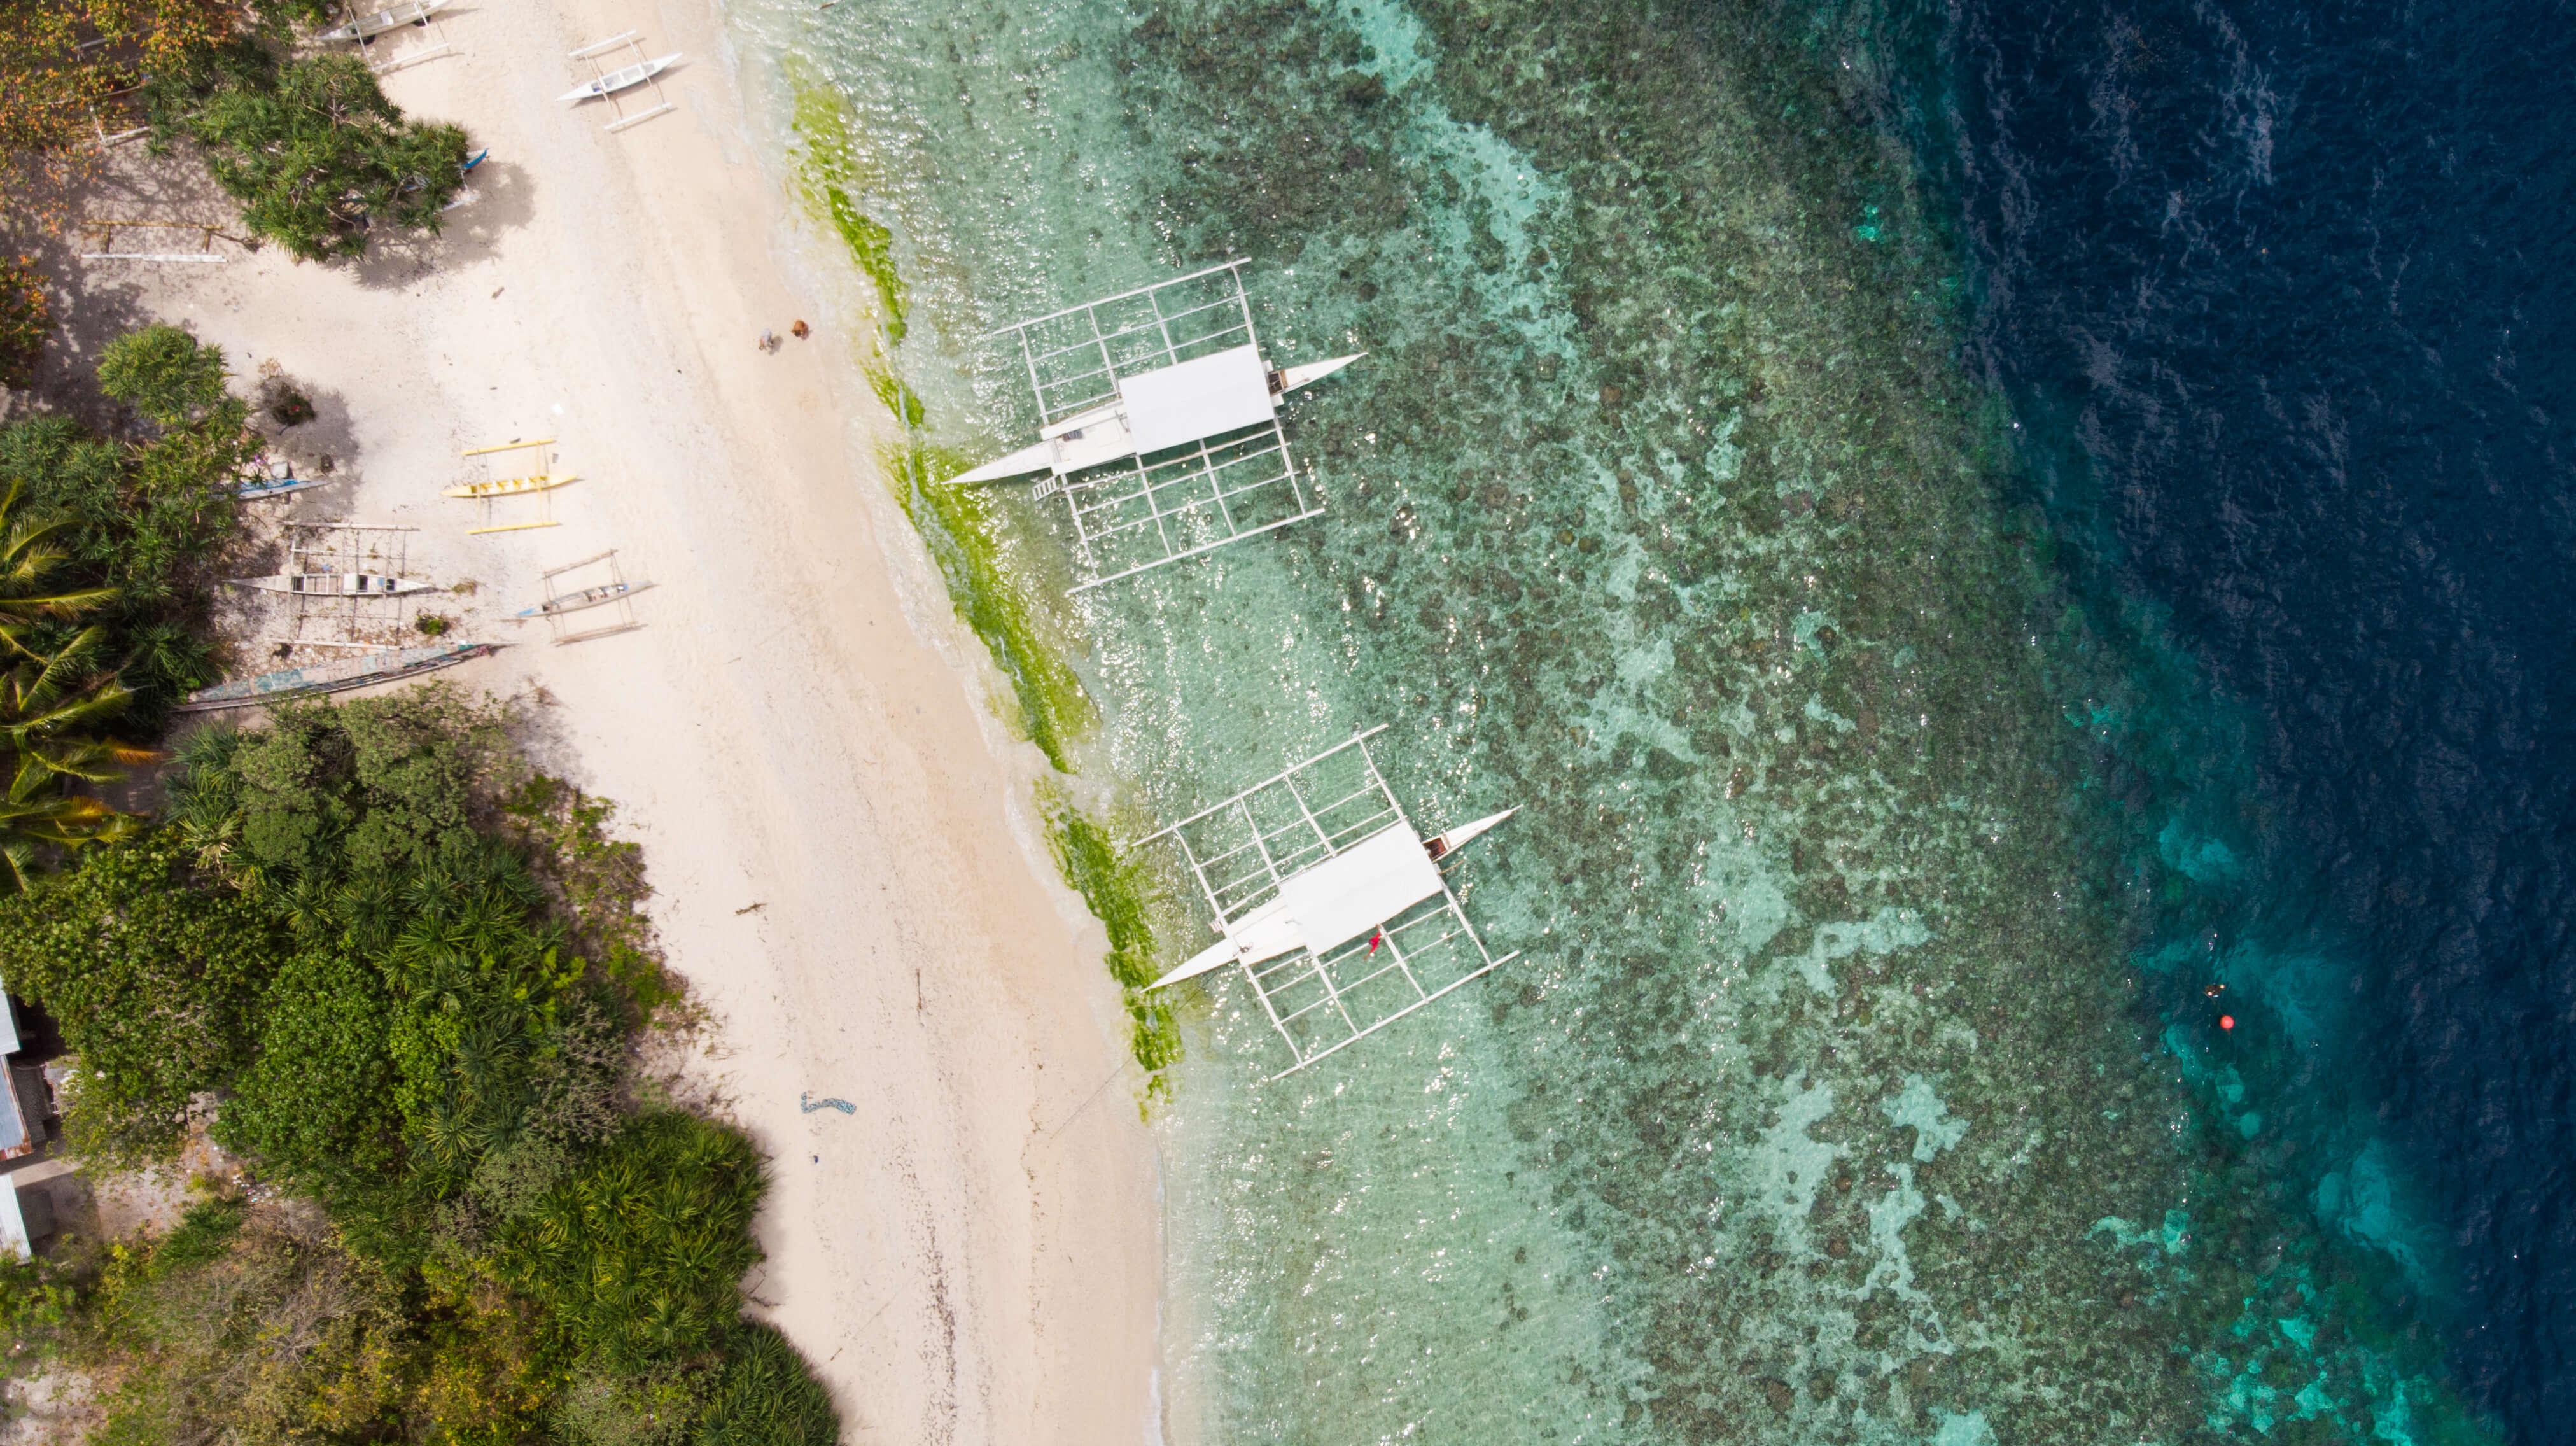 Offbeat Escapades - Travel to Bohol from Manila or Cebu Itinerary and Budget